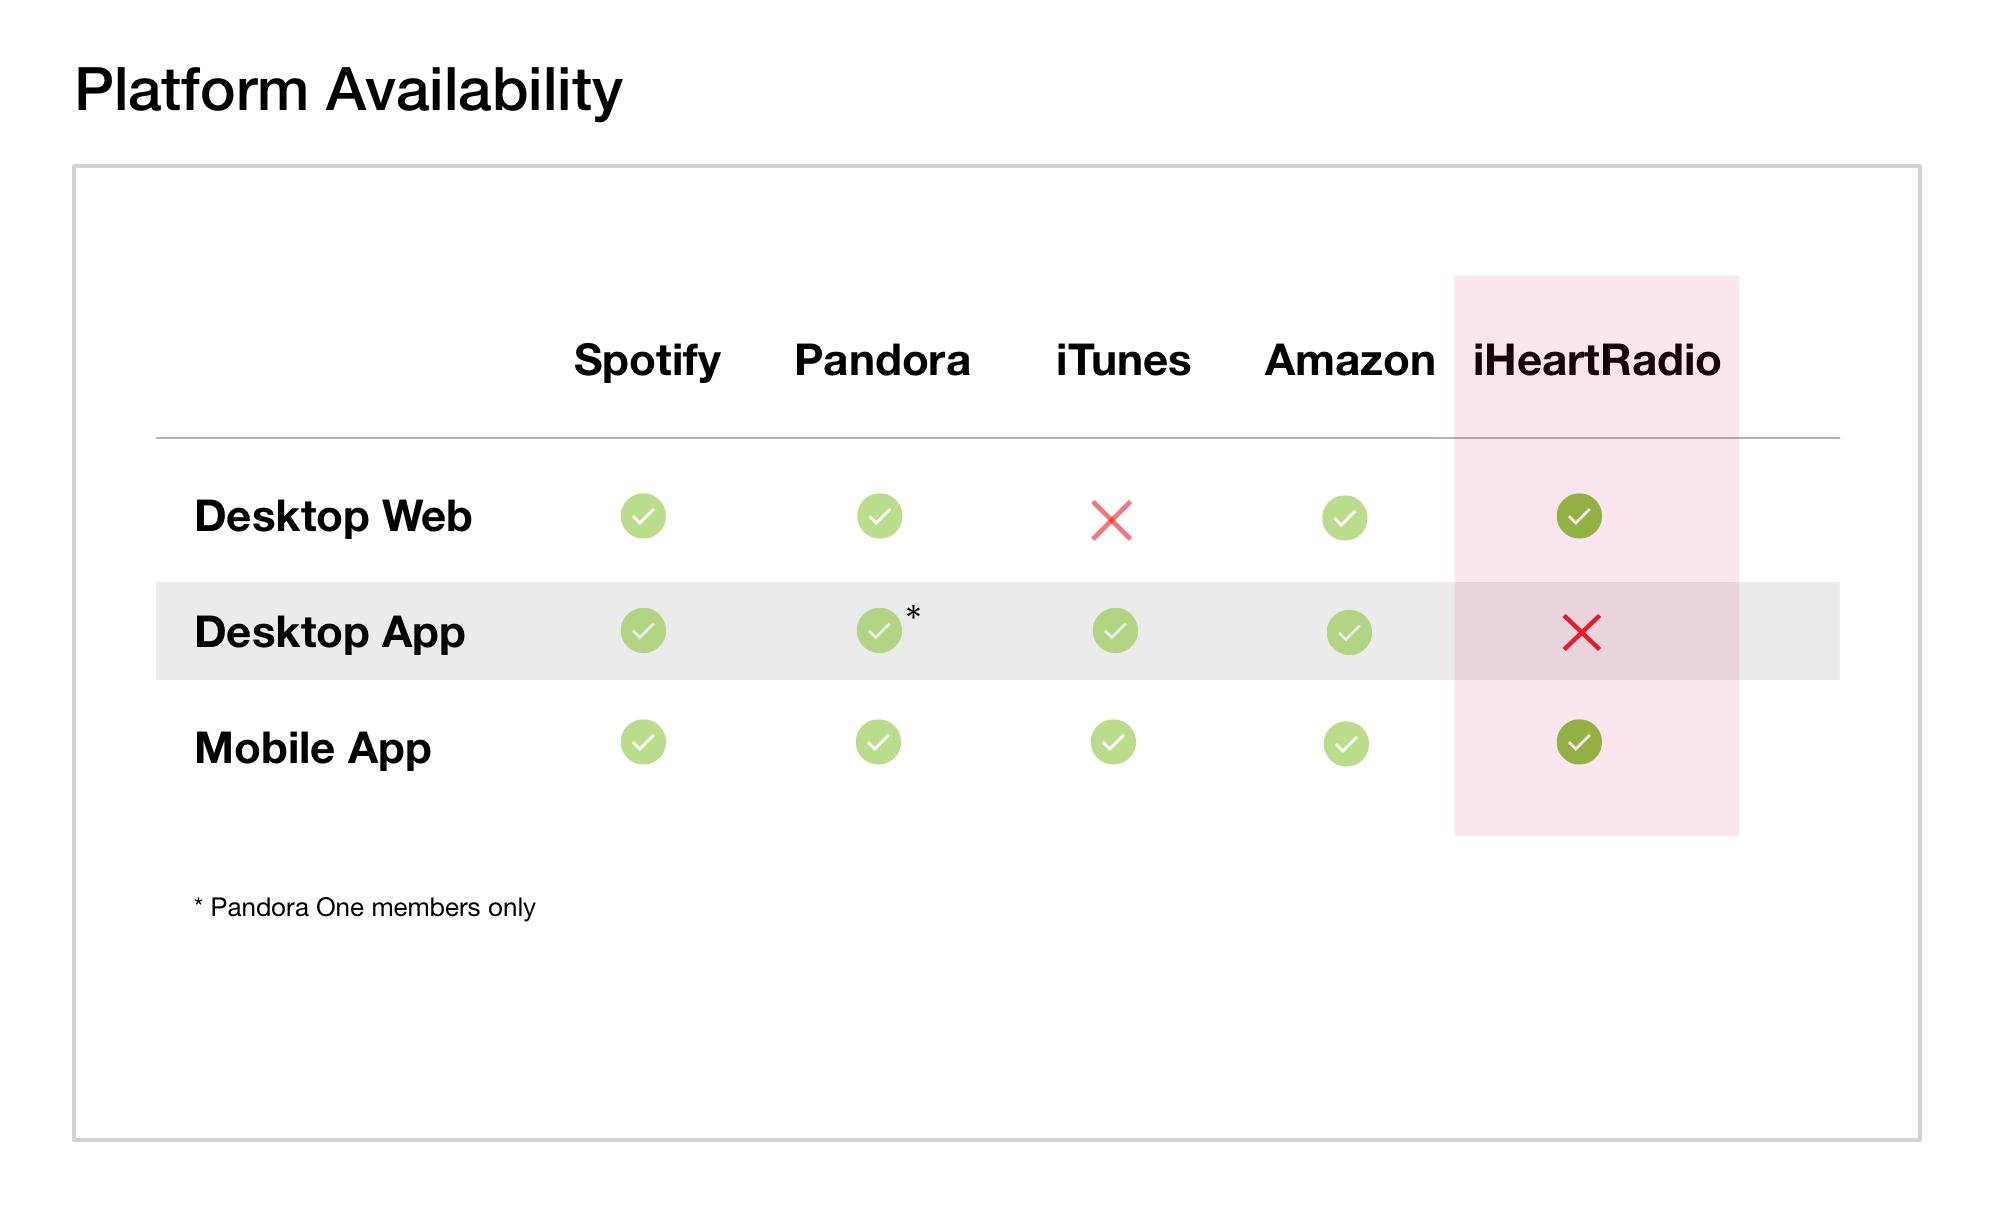 Figure 5.  Competitor platform availability.